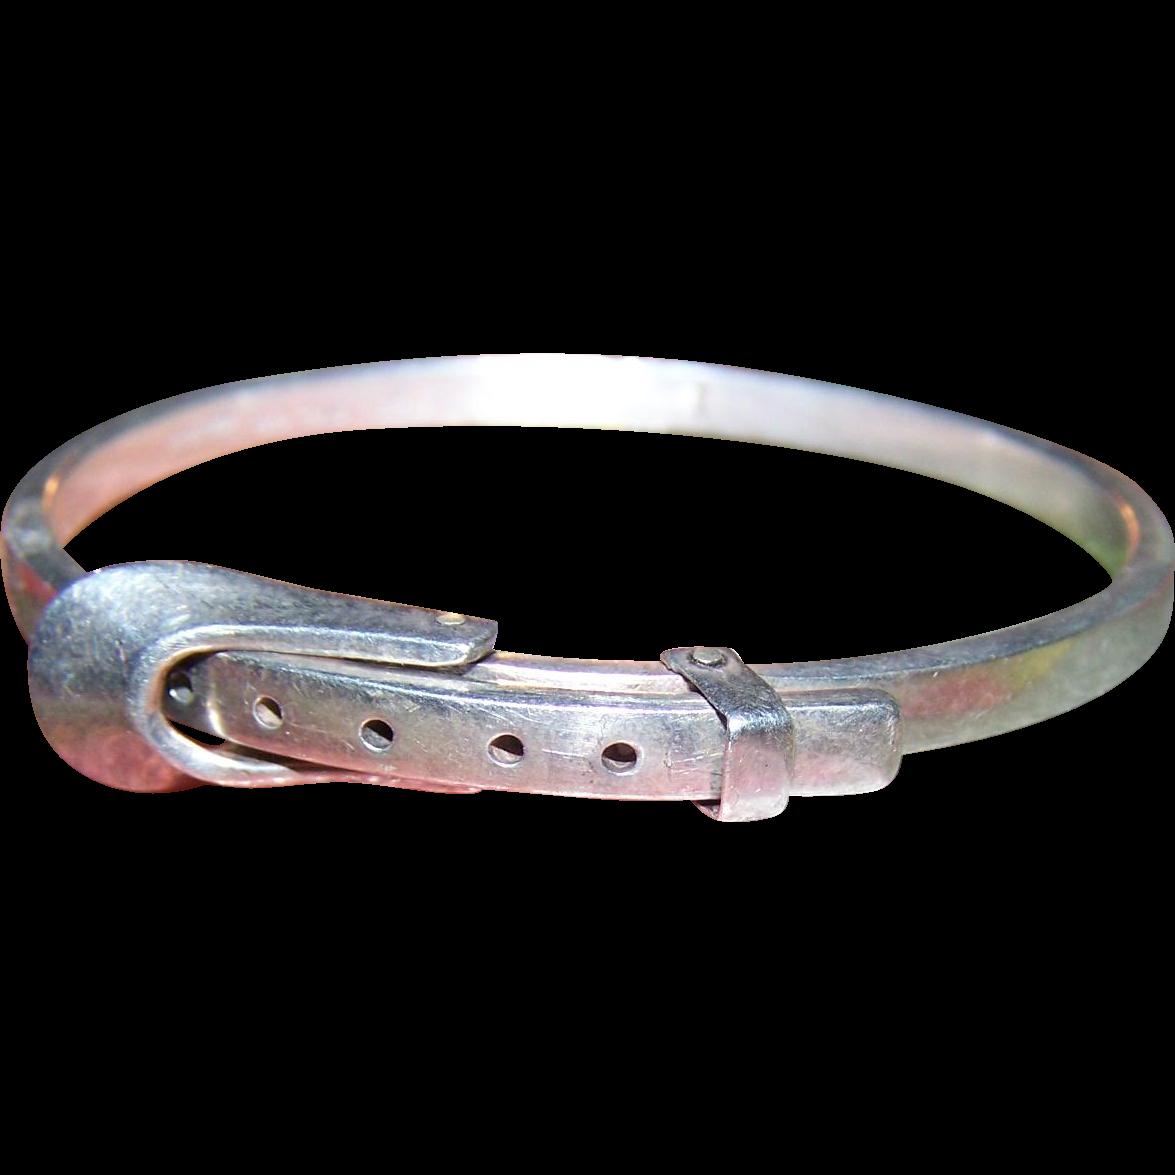 A Vintage  Sterling Silver 925  Belt Buckle Hinged Bangle Bracelet Hecho En Mexico TR-68 925